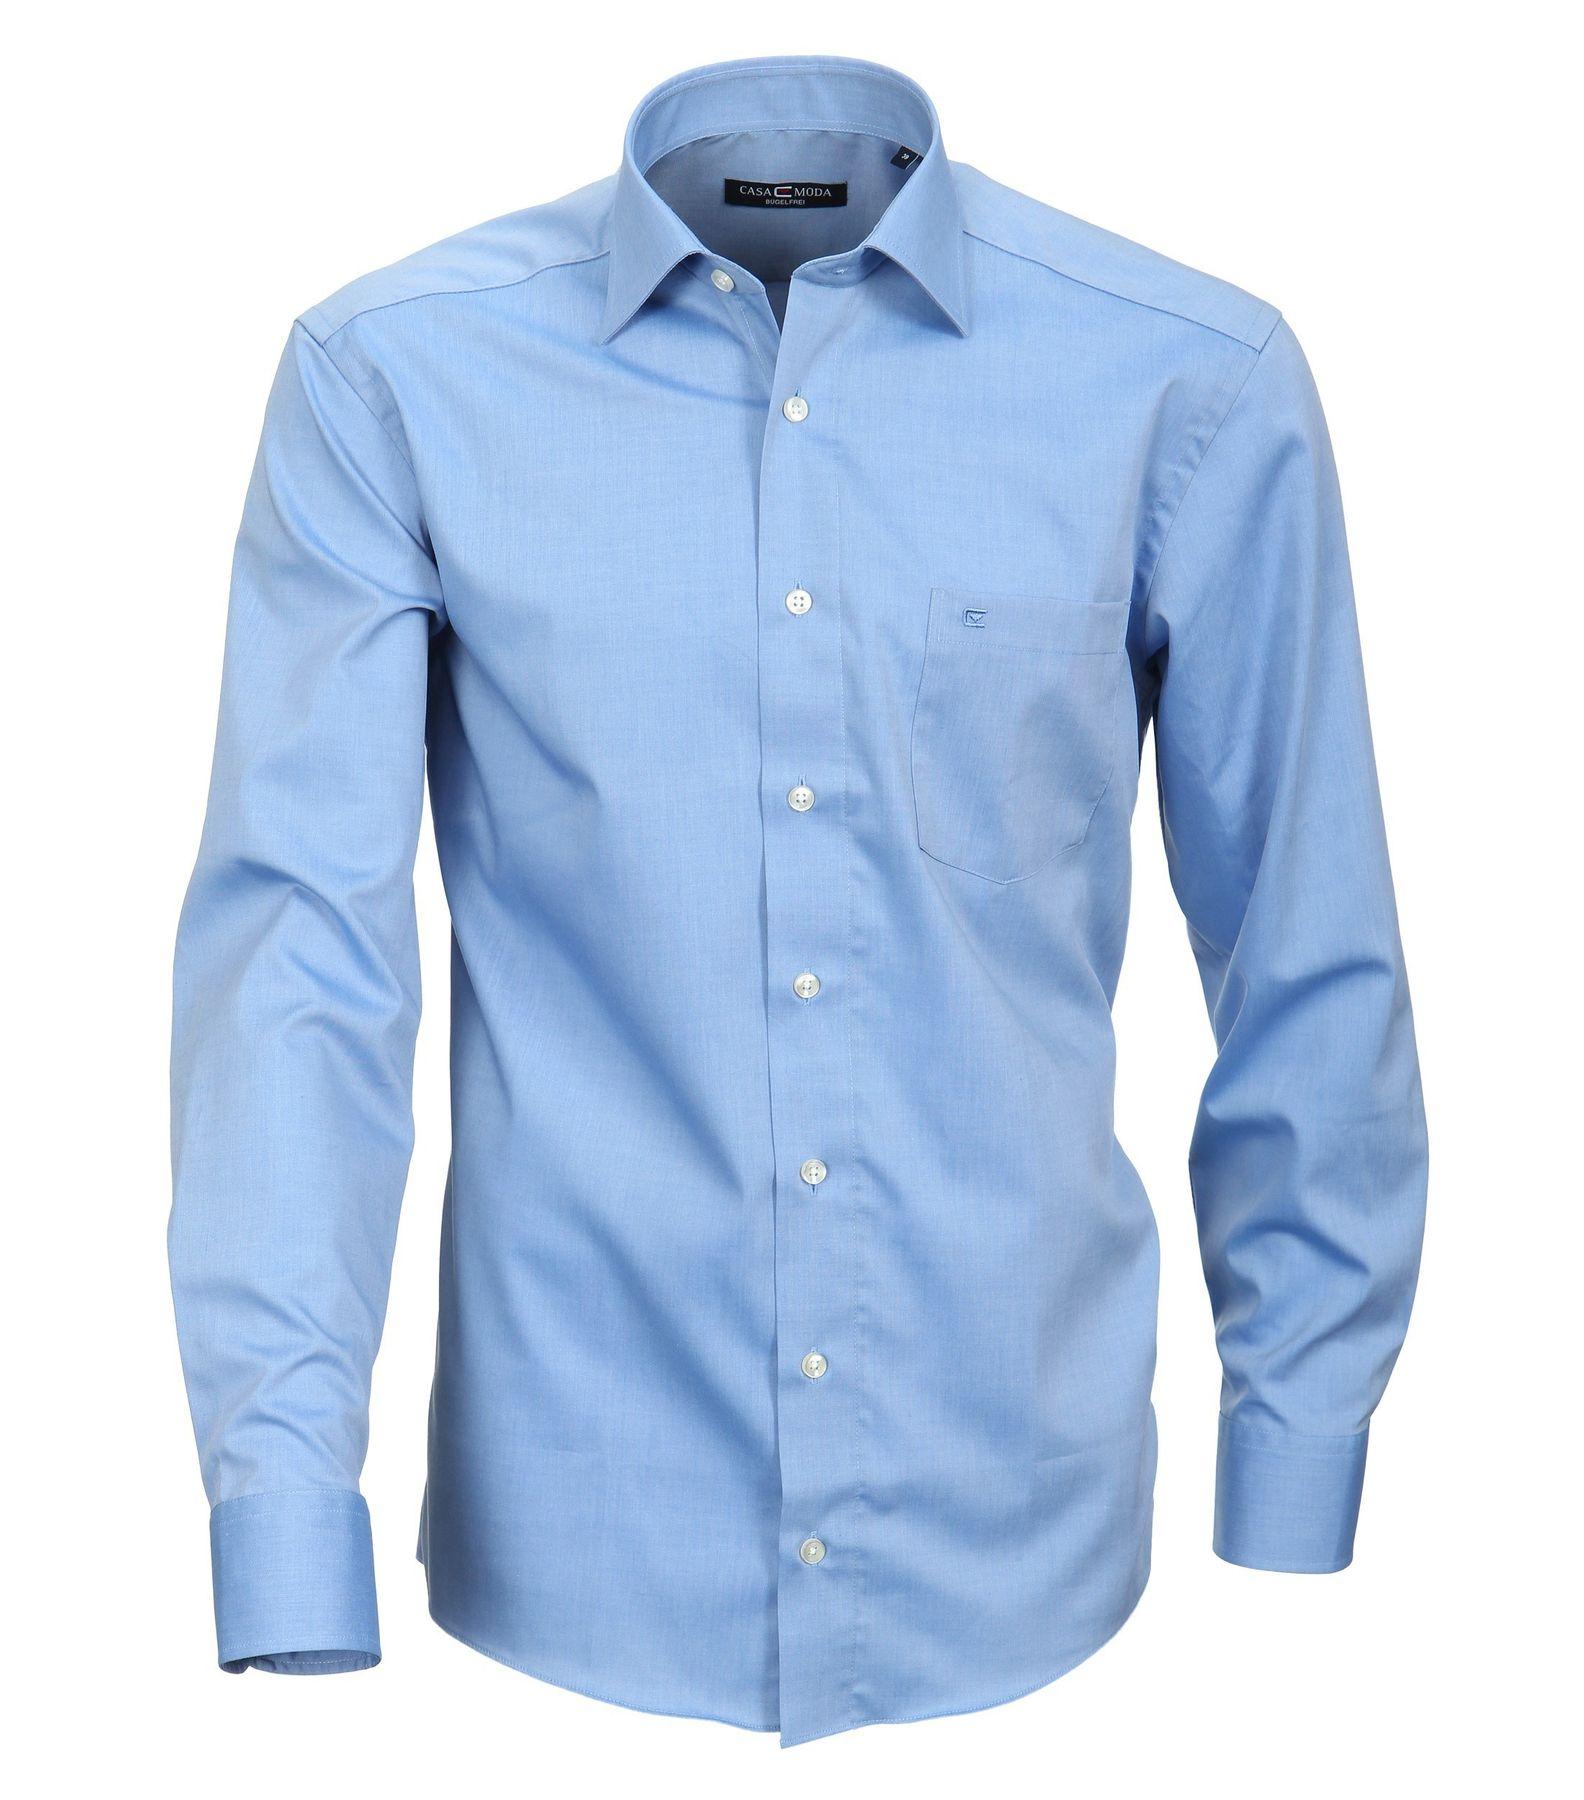 Casa Moda - Comfort Fit - Bügelfreies Herren Business Hemd mit Extra langem Arm (72cm) in verschiedenen Farben (006062) – Bild 7